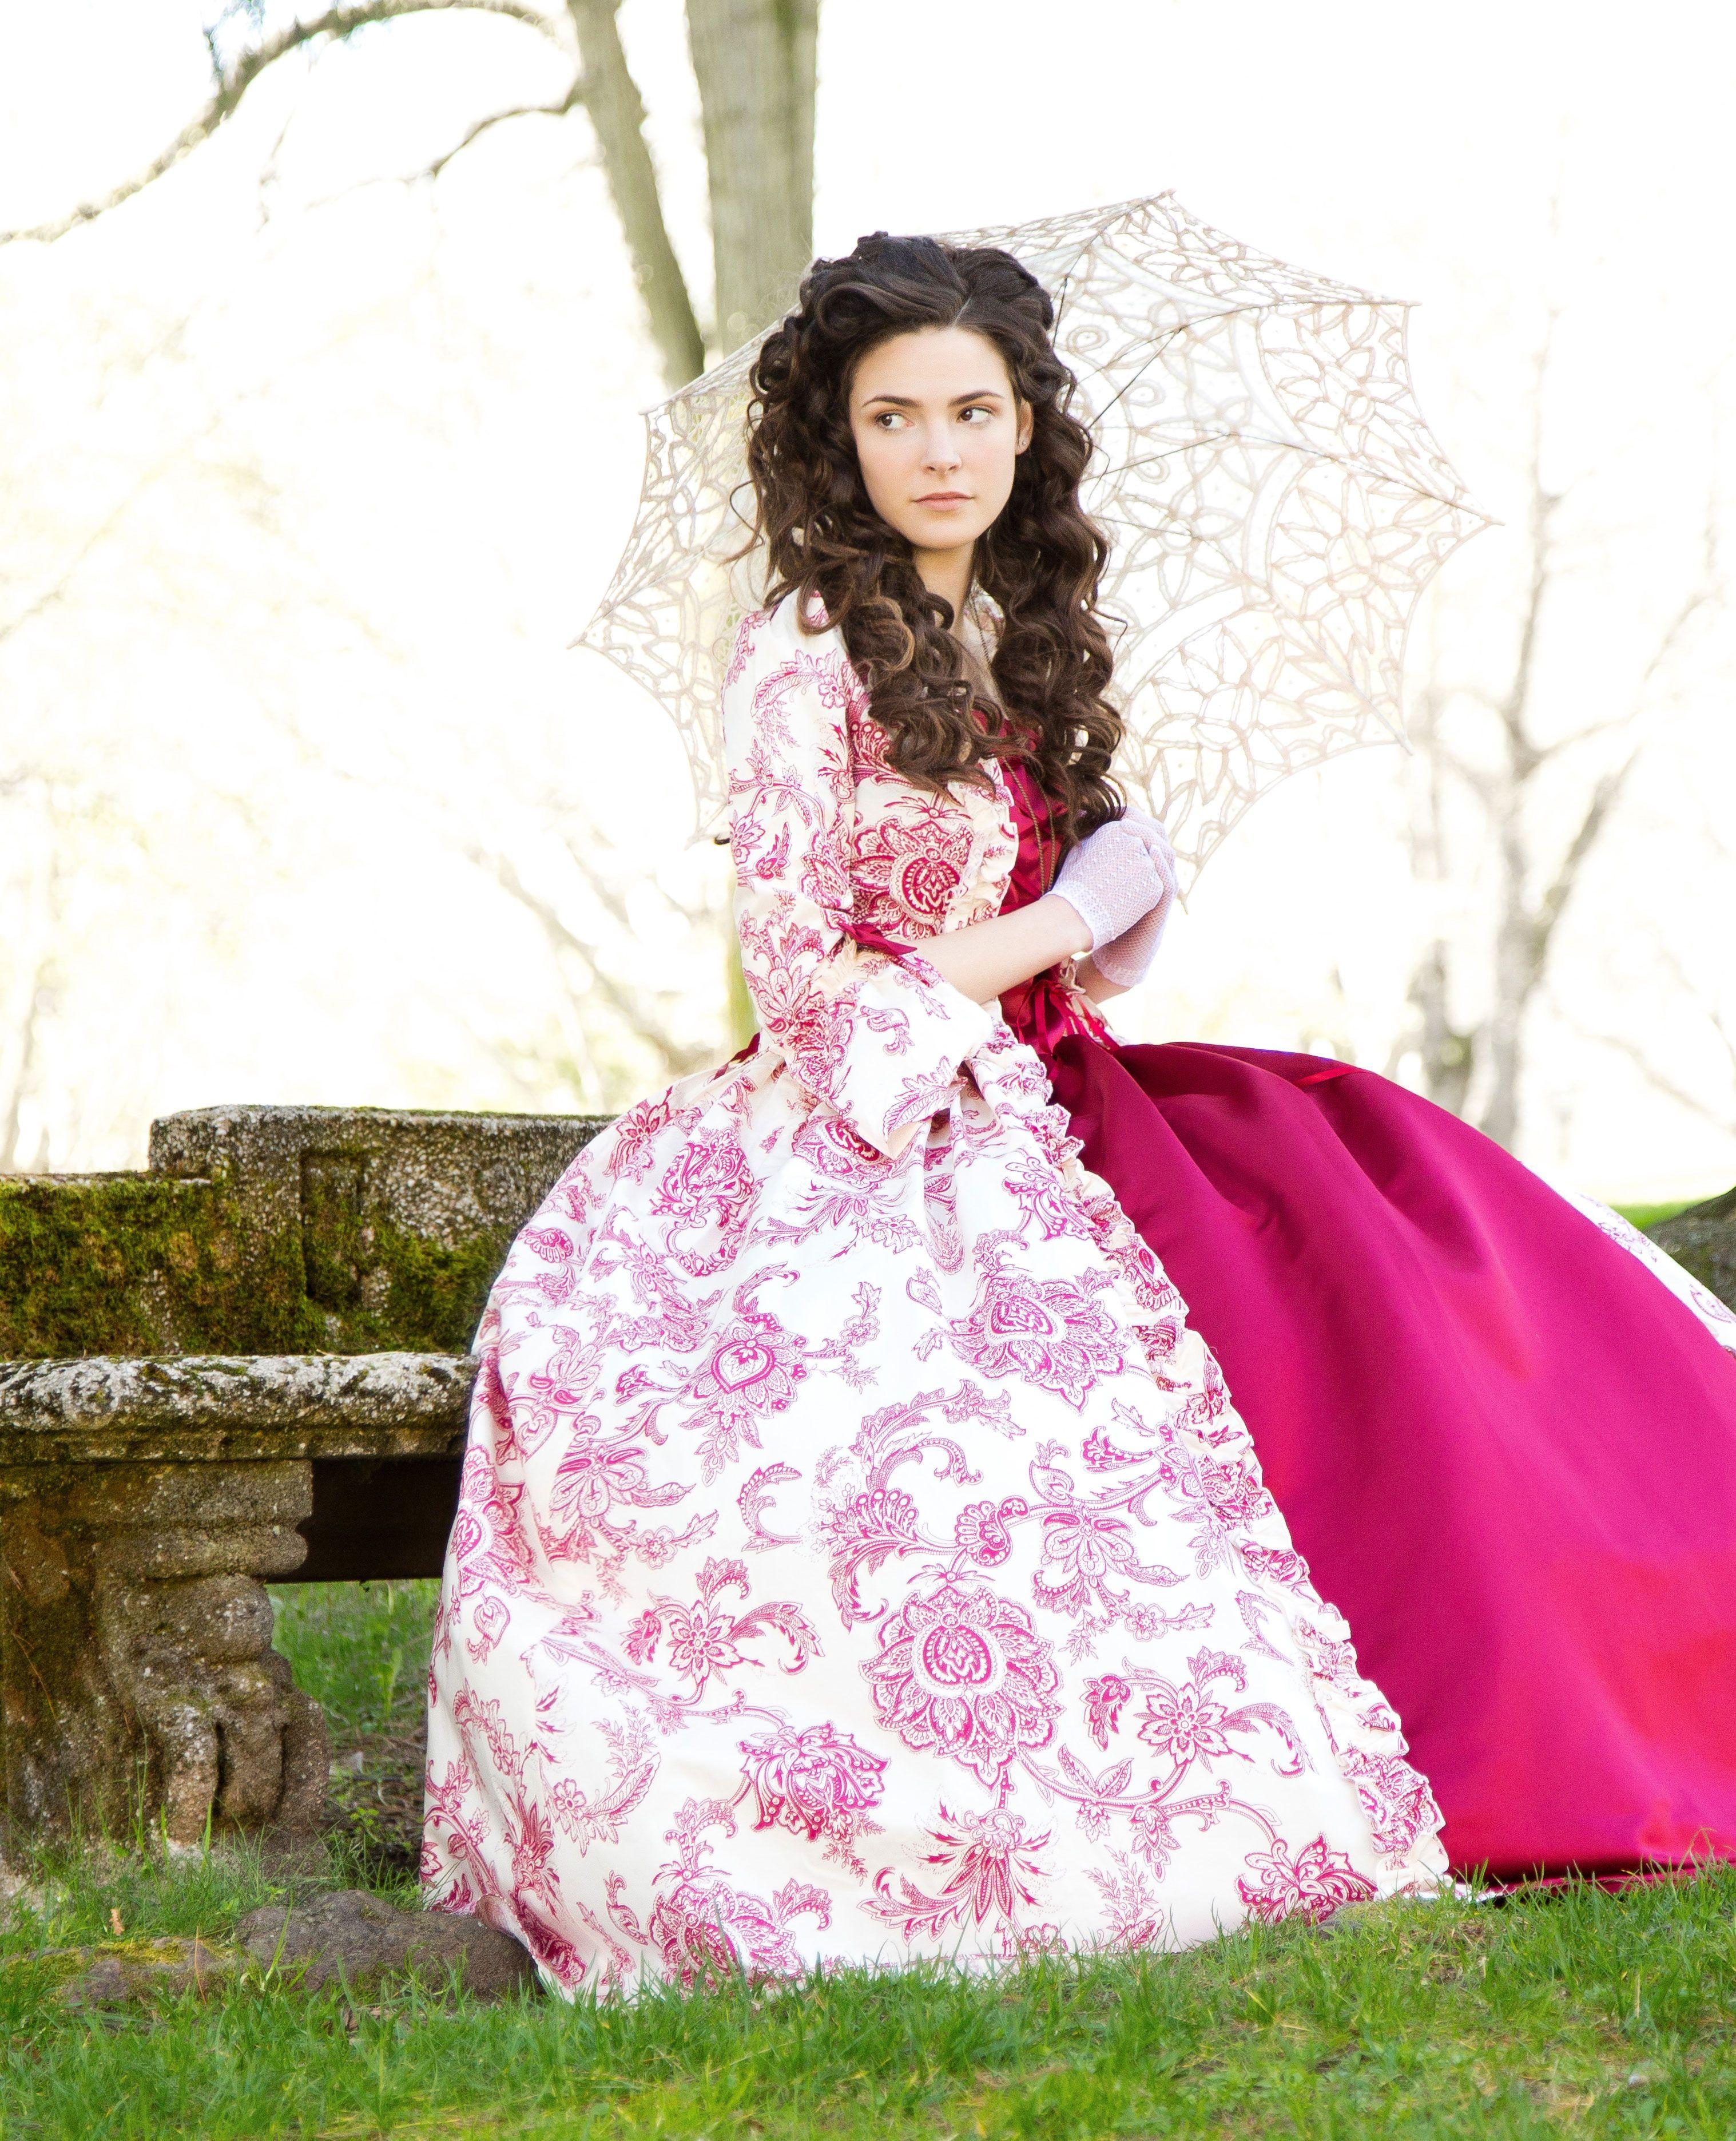 28 mejores imágenes sobre Wedding Dresses en Pinterest | Vestidos ...